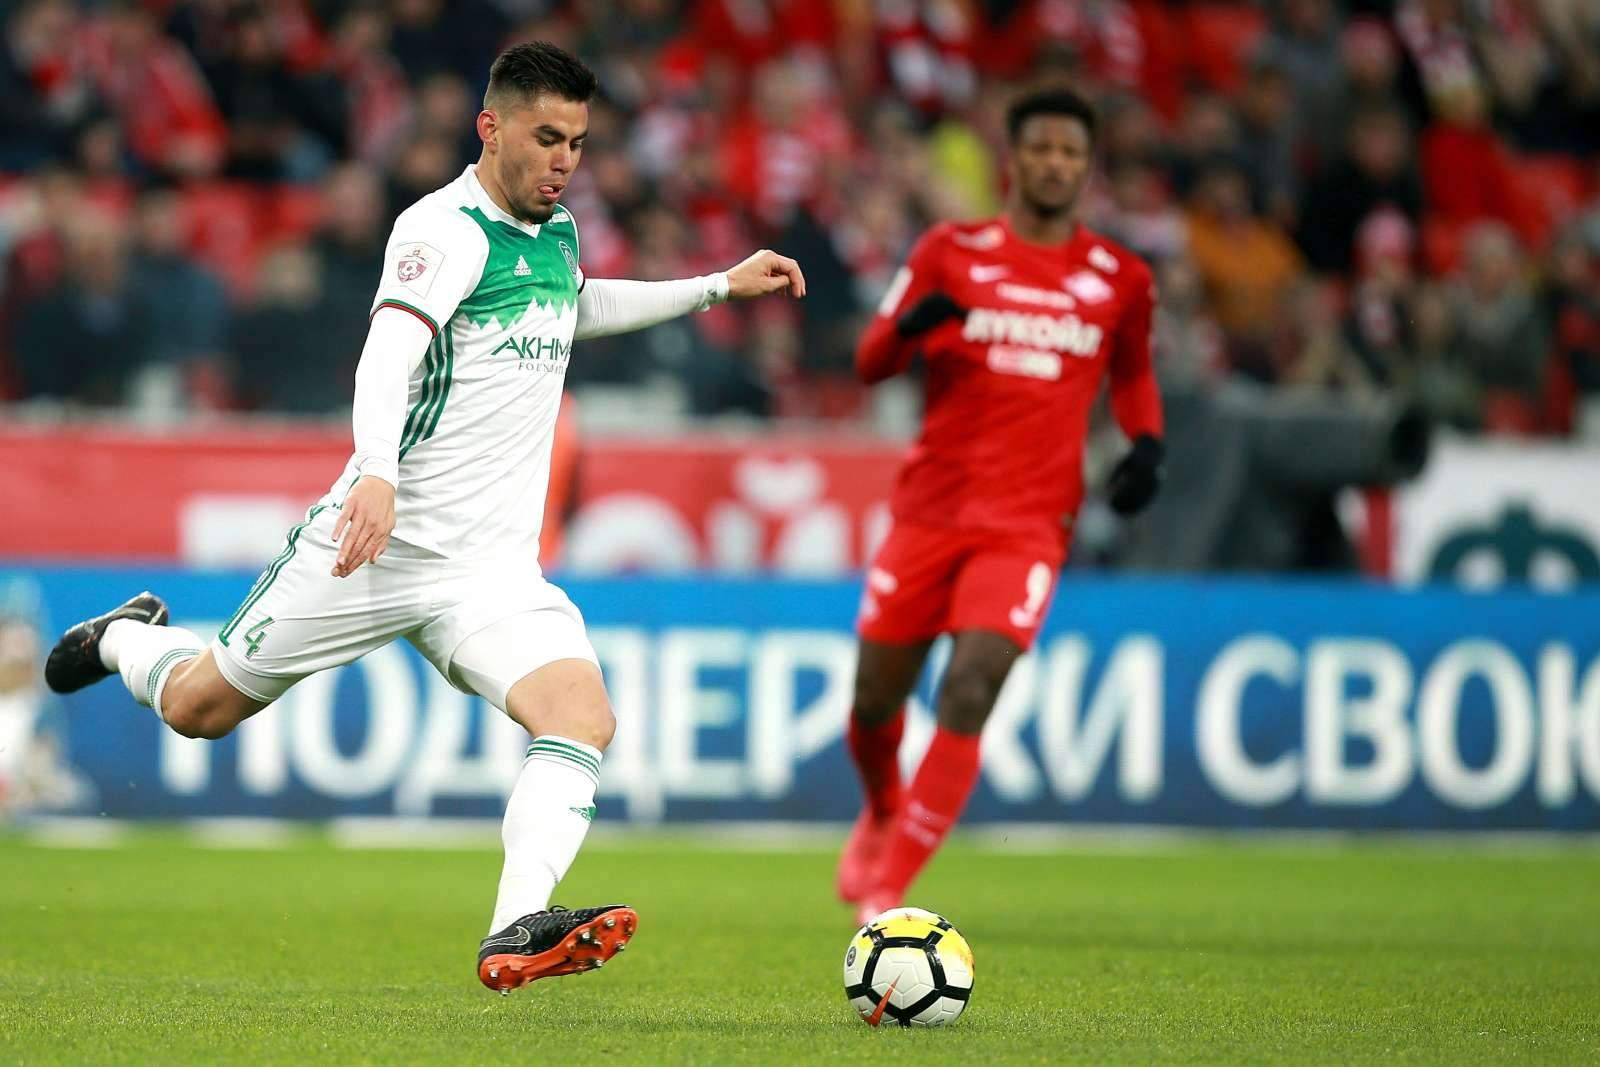 Экс-игрок «Ахмата» подписал контракт с турецким клубом